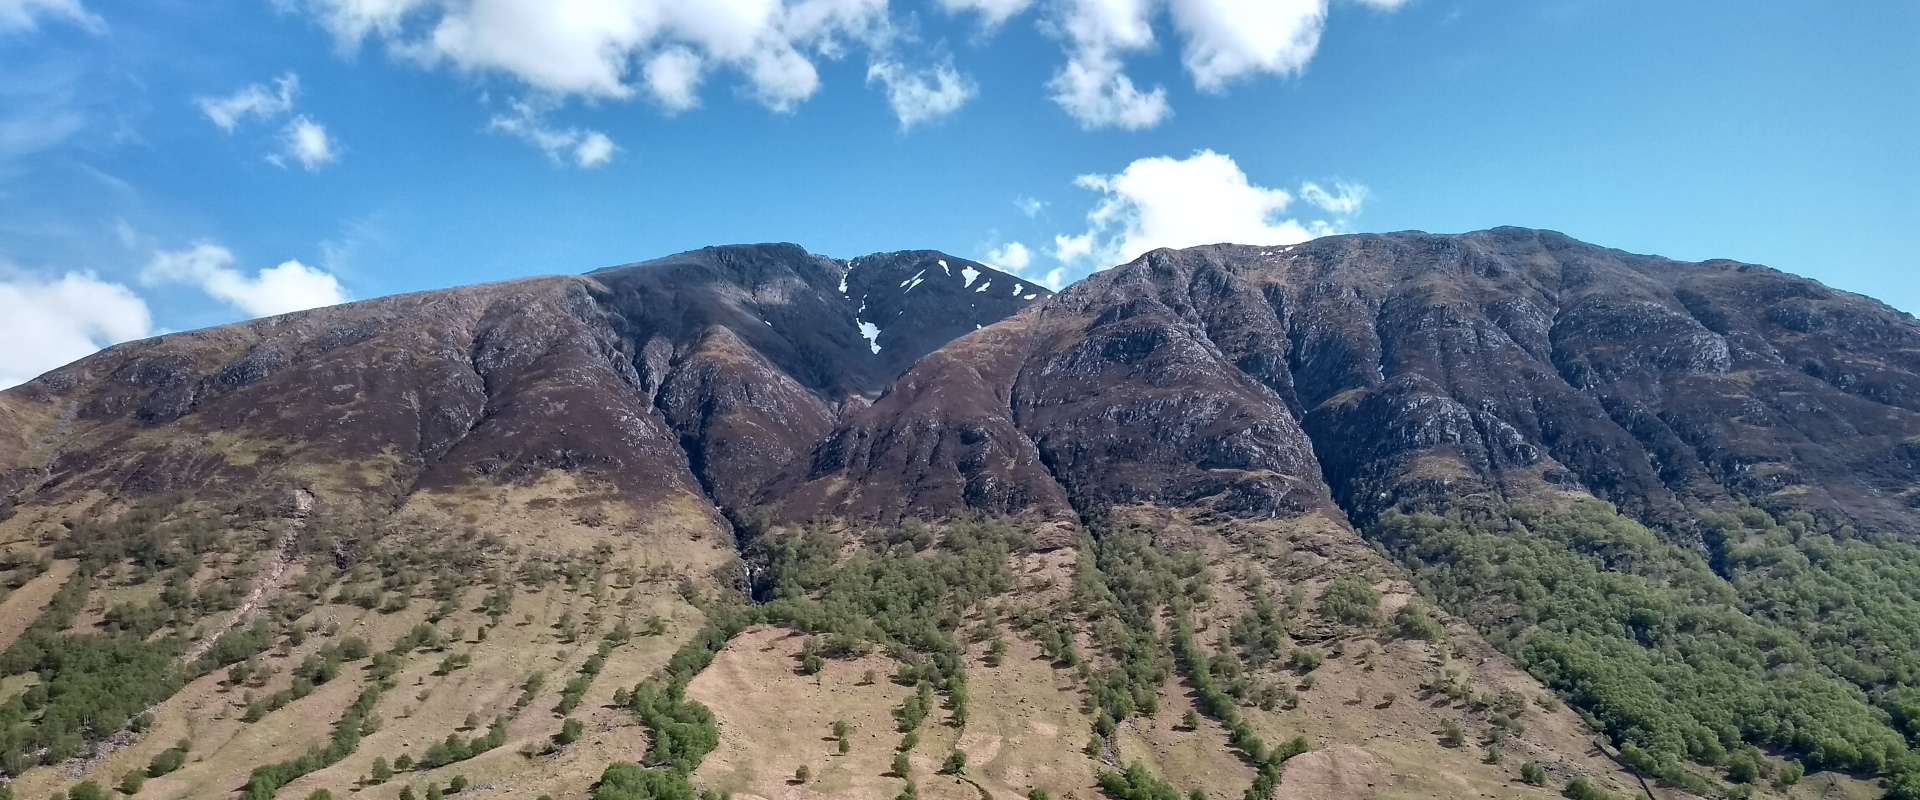 Ben Nevis Scottish Highlands Walking Holiday